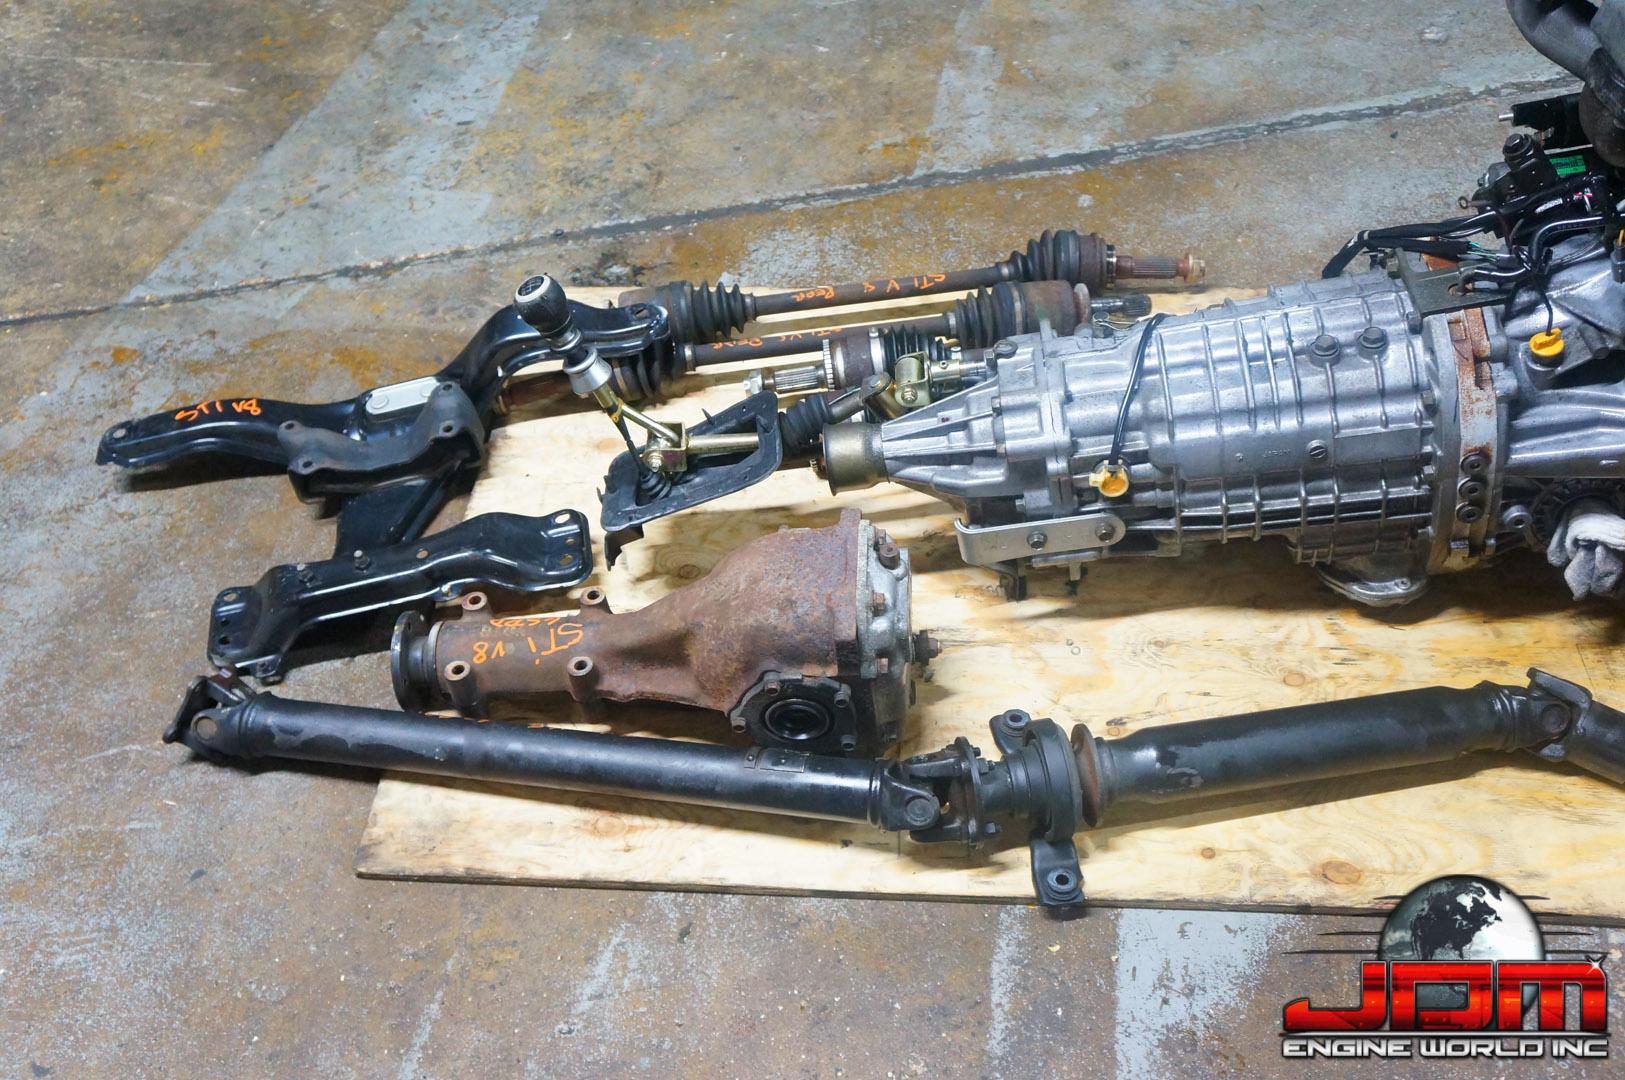 JDM SUBARU IMPREZA WRX STI 2.0L V8 TURBO ENGINE 6-SPEED MANUAL AWD TRANSMISSION